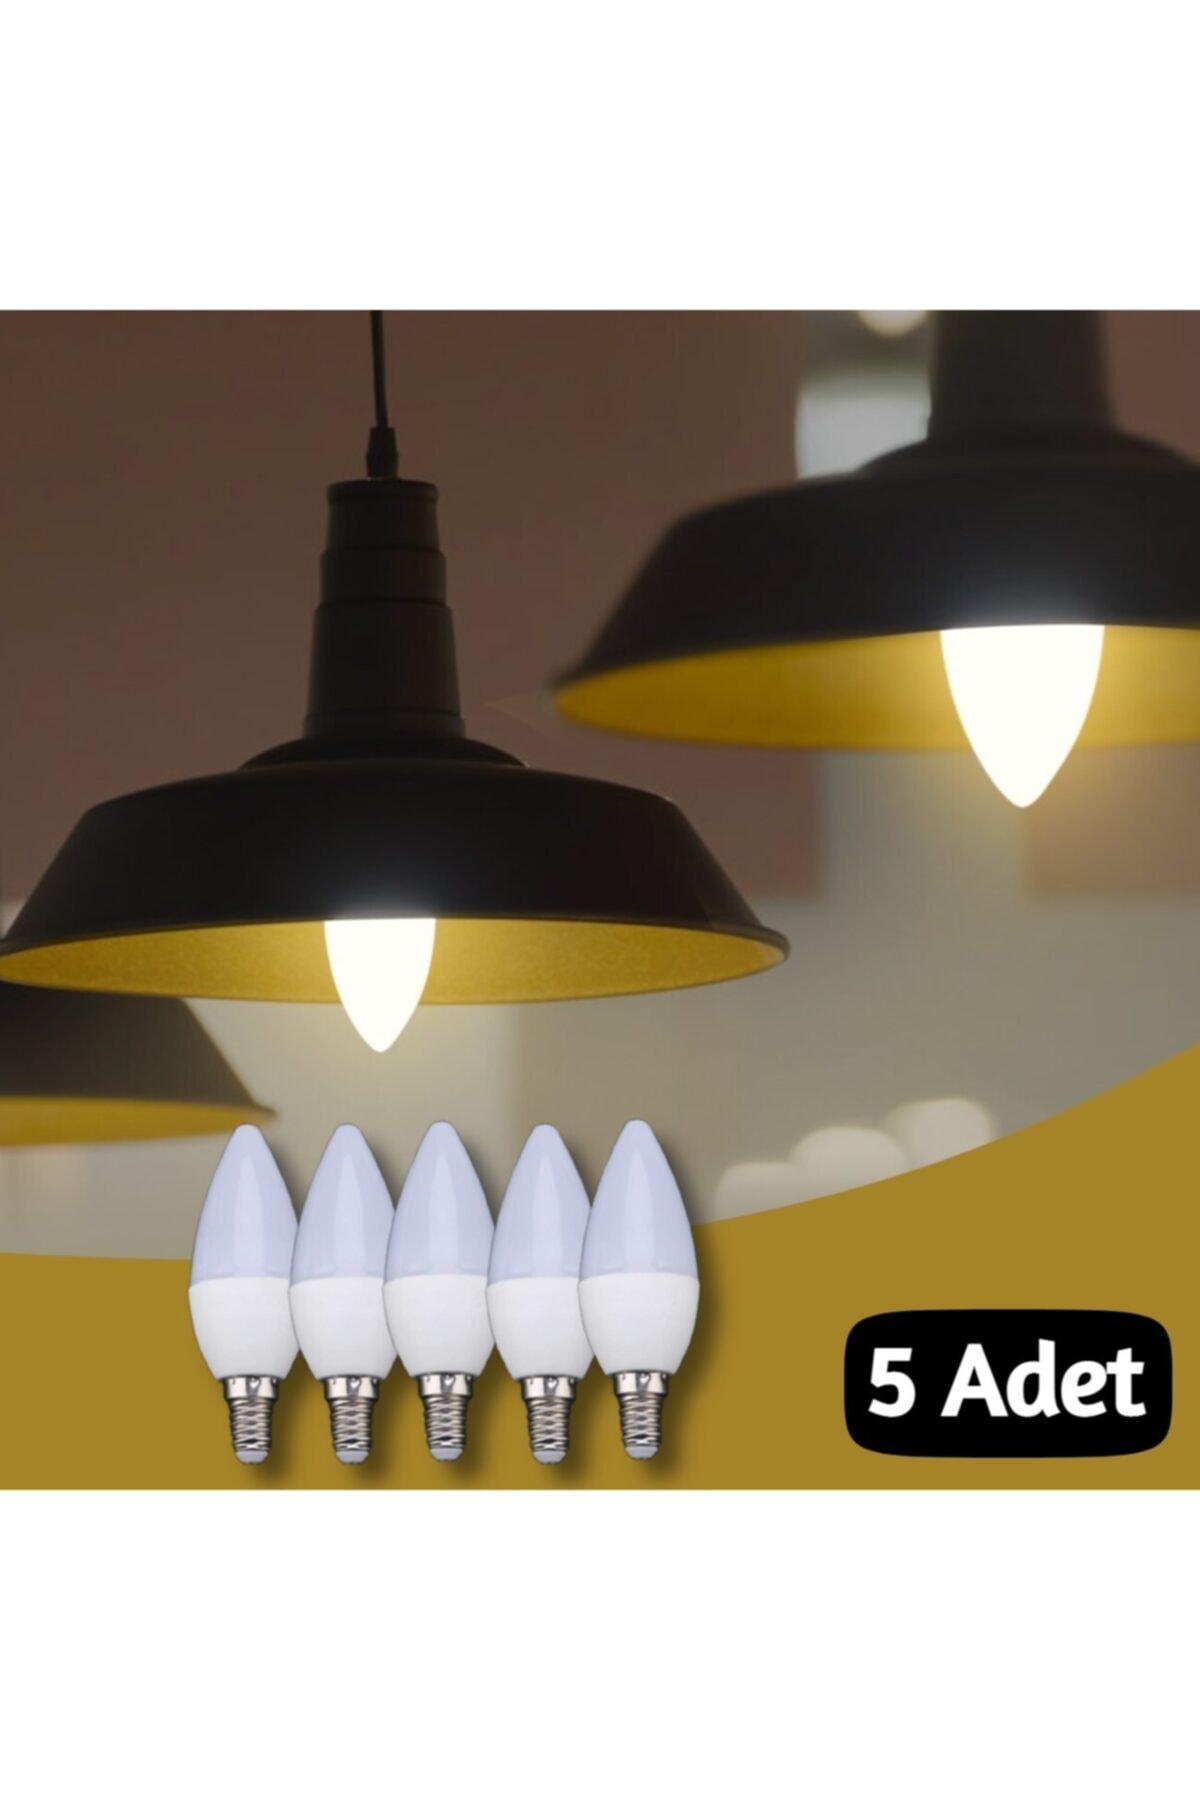 VİE 5 Adet 7 Watt E14 Ince Duy Beyaz Işık Mum Buji Led Ampul